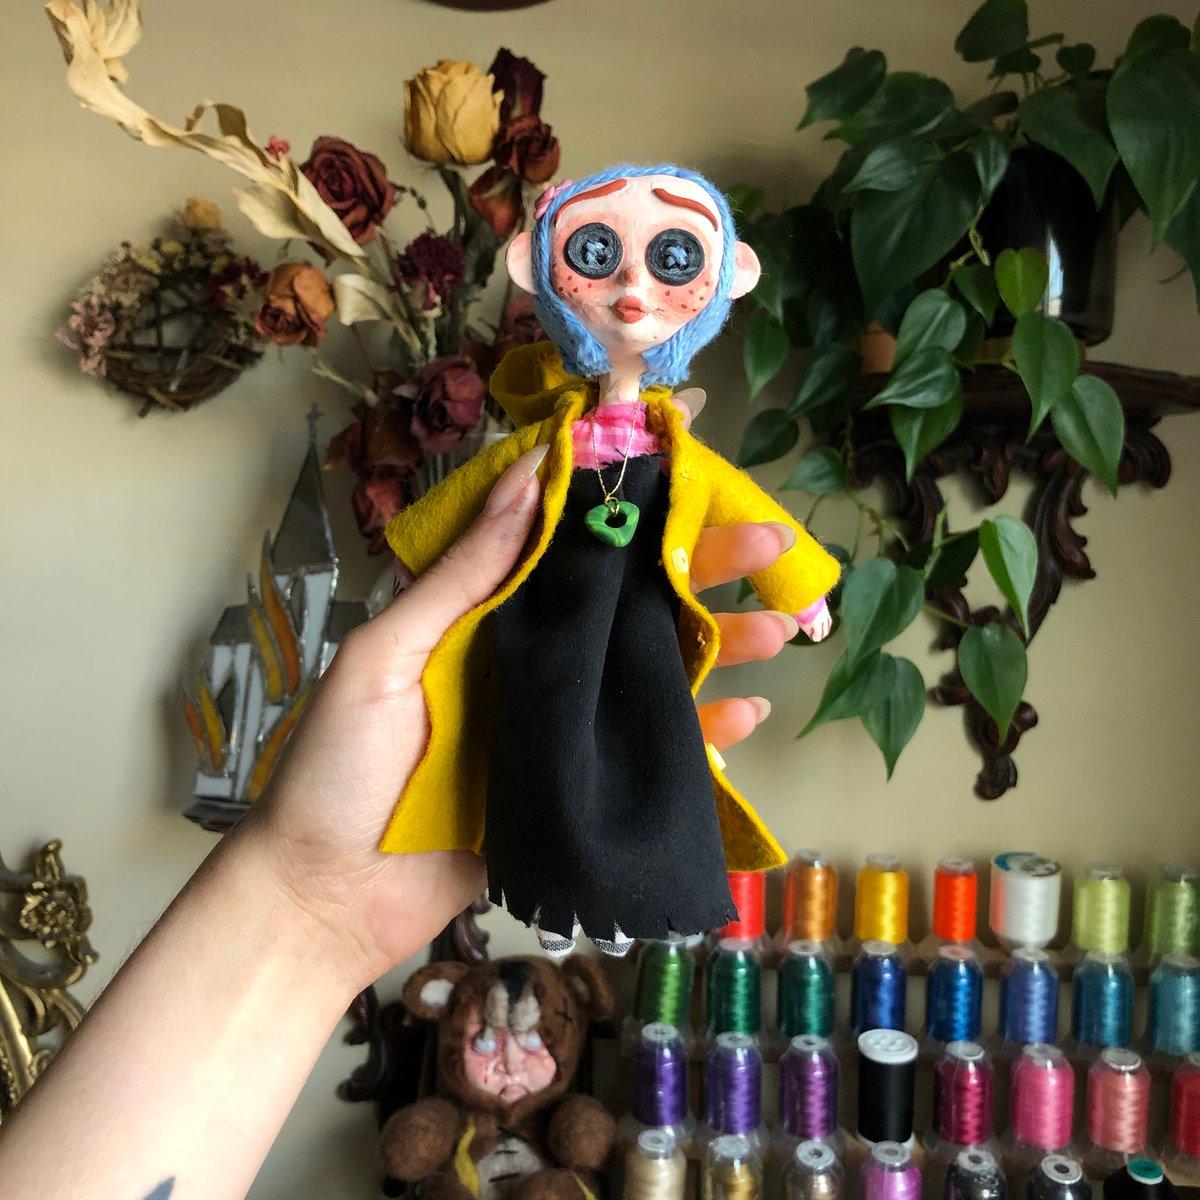 Image of Handmade Coraline doll